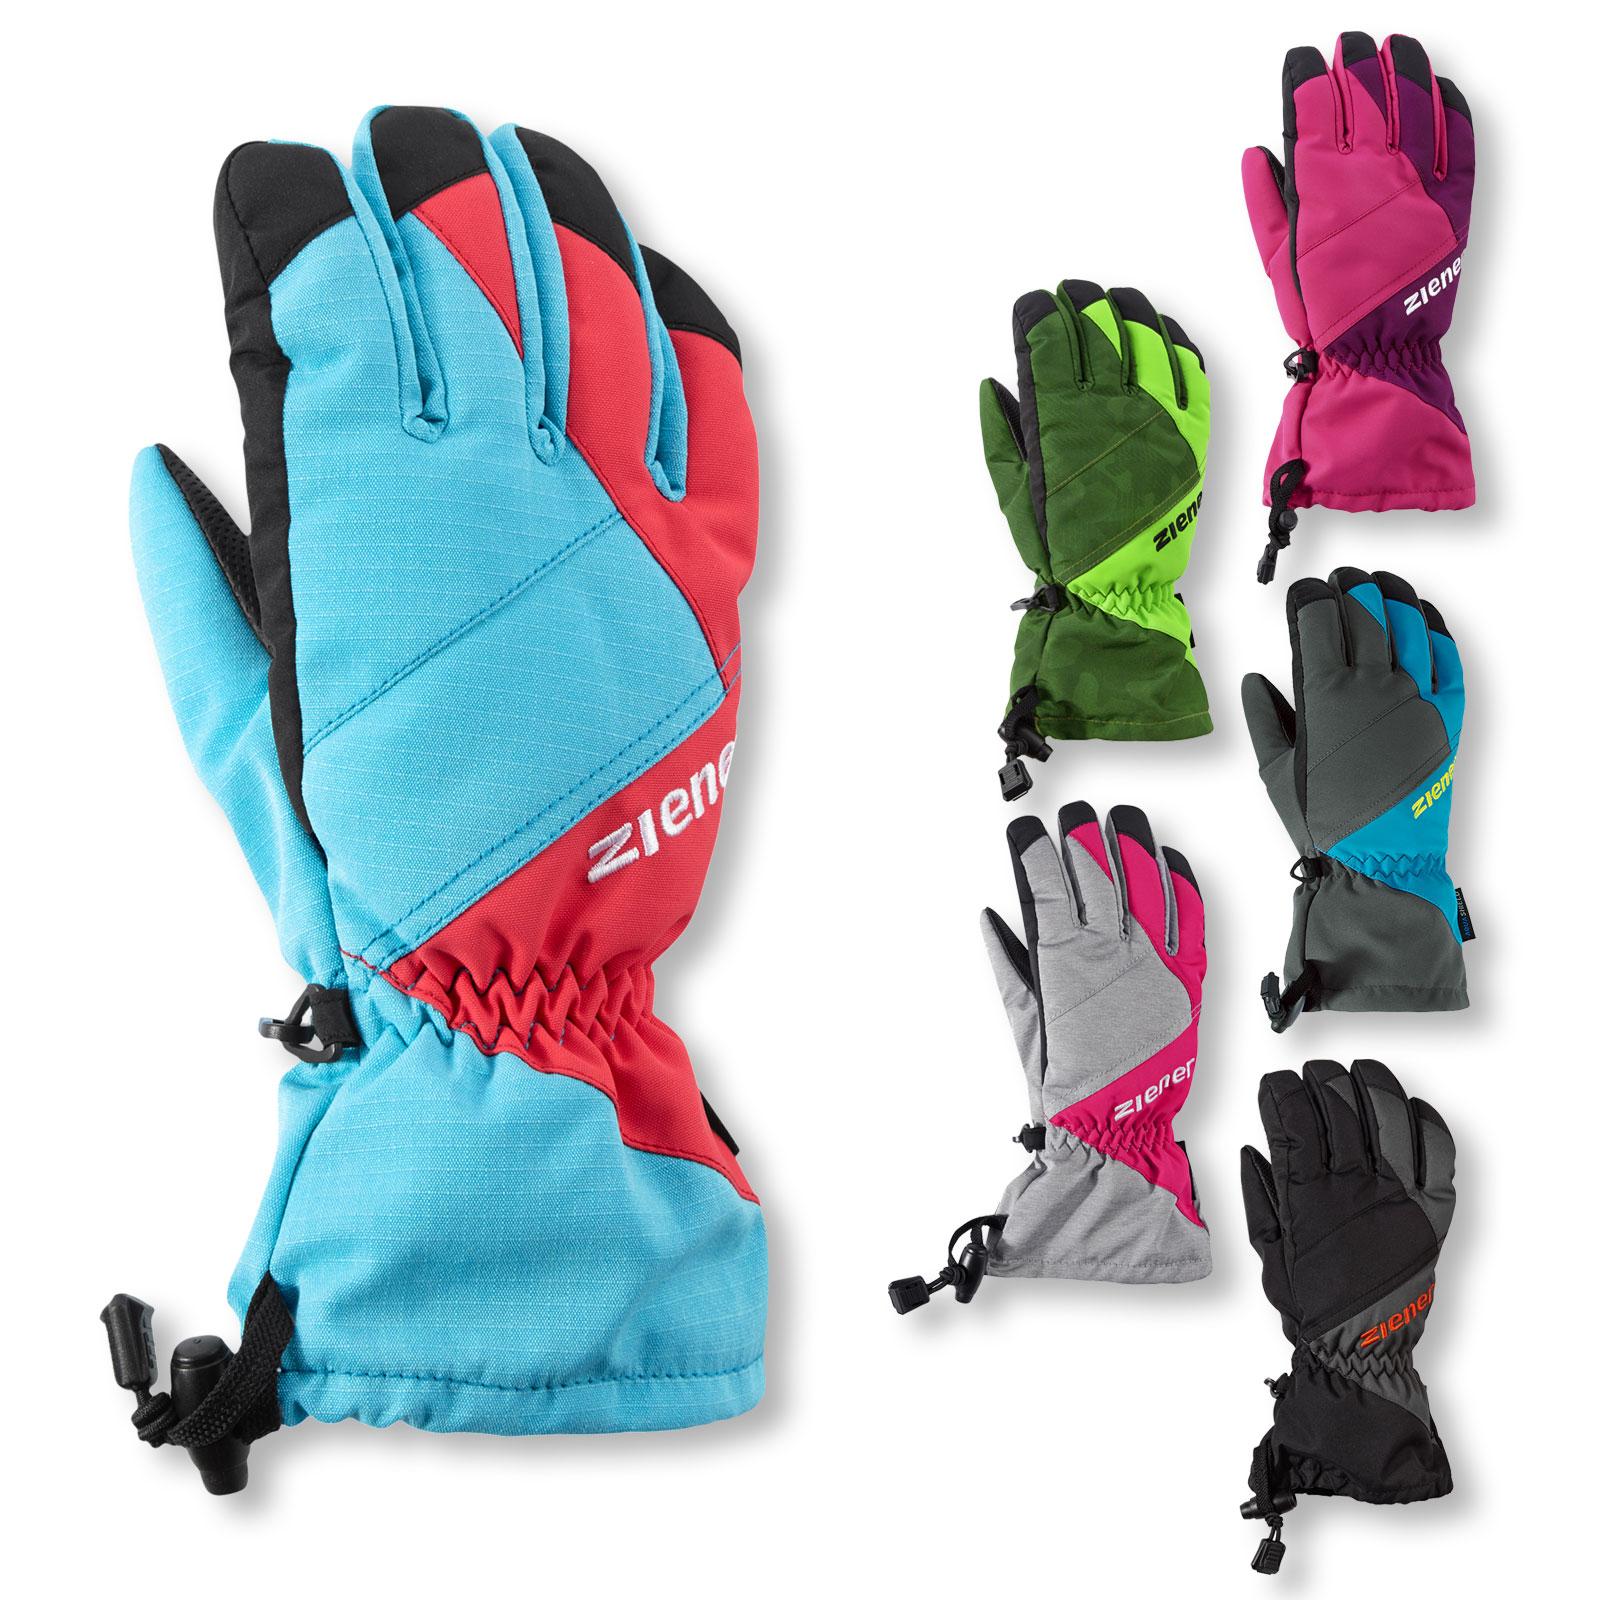 Ziener Skihandschuhe AGIL AS® glove Junior Handschuhe Kinder in pink blossom / plumberry